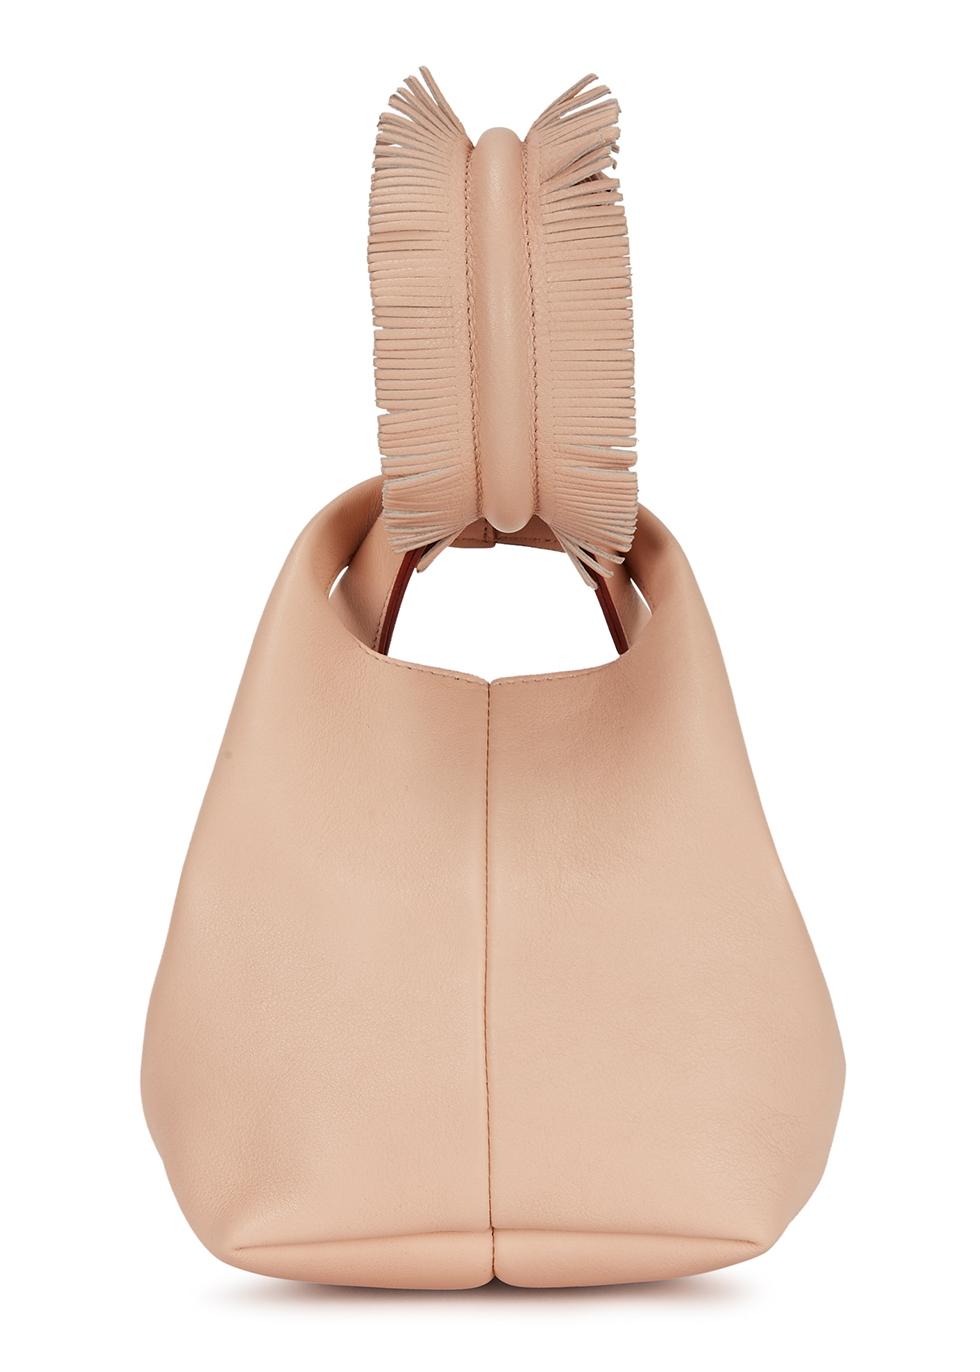 Petite V powder-pink leather clutch - Elena Ghisellini